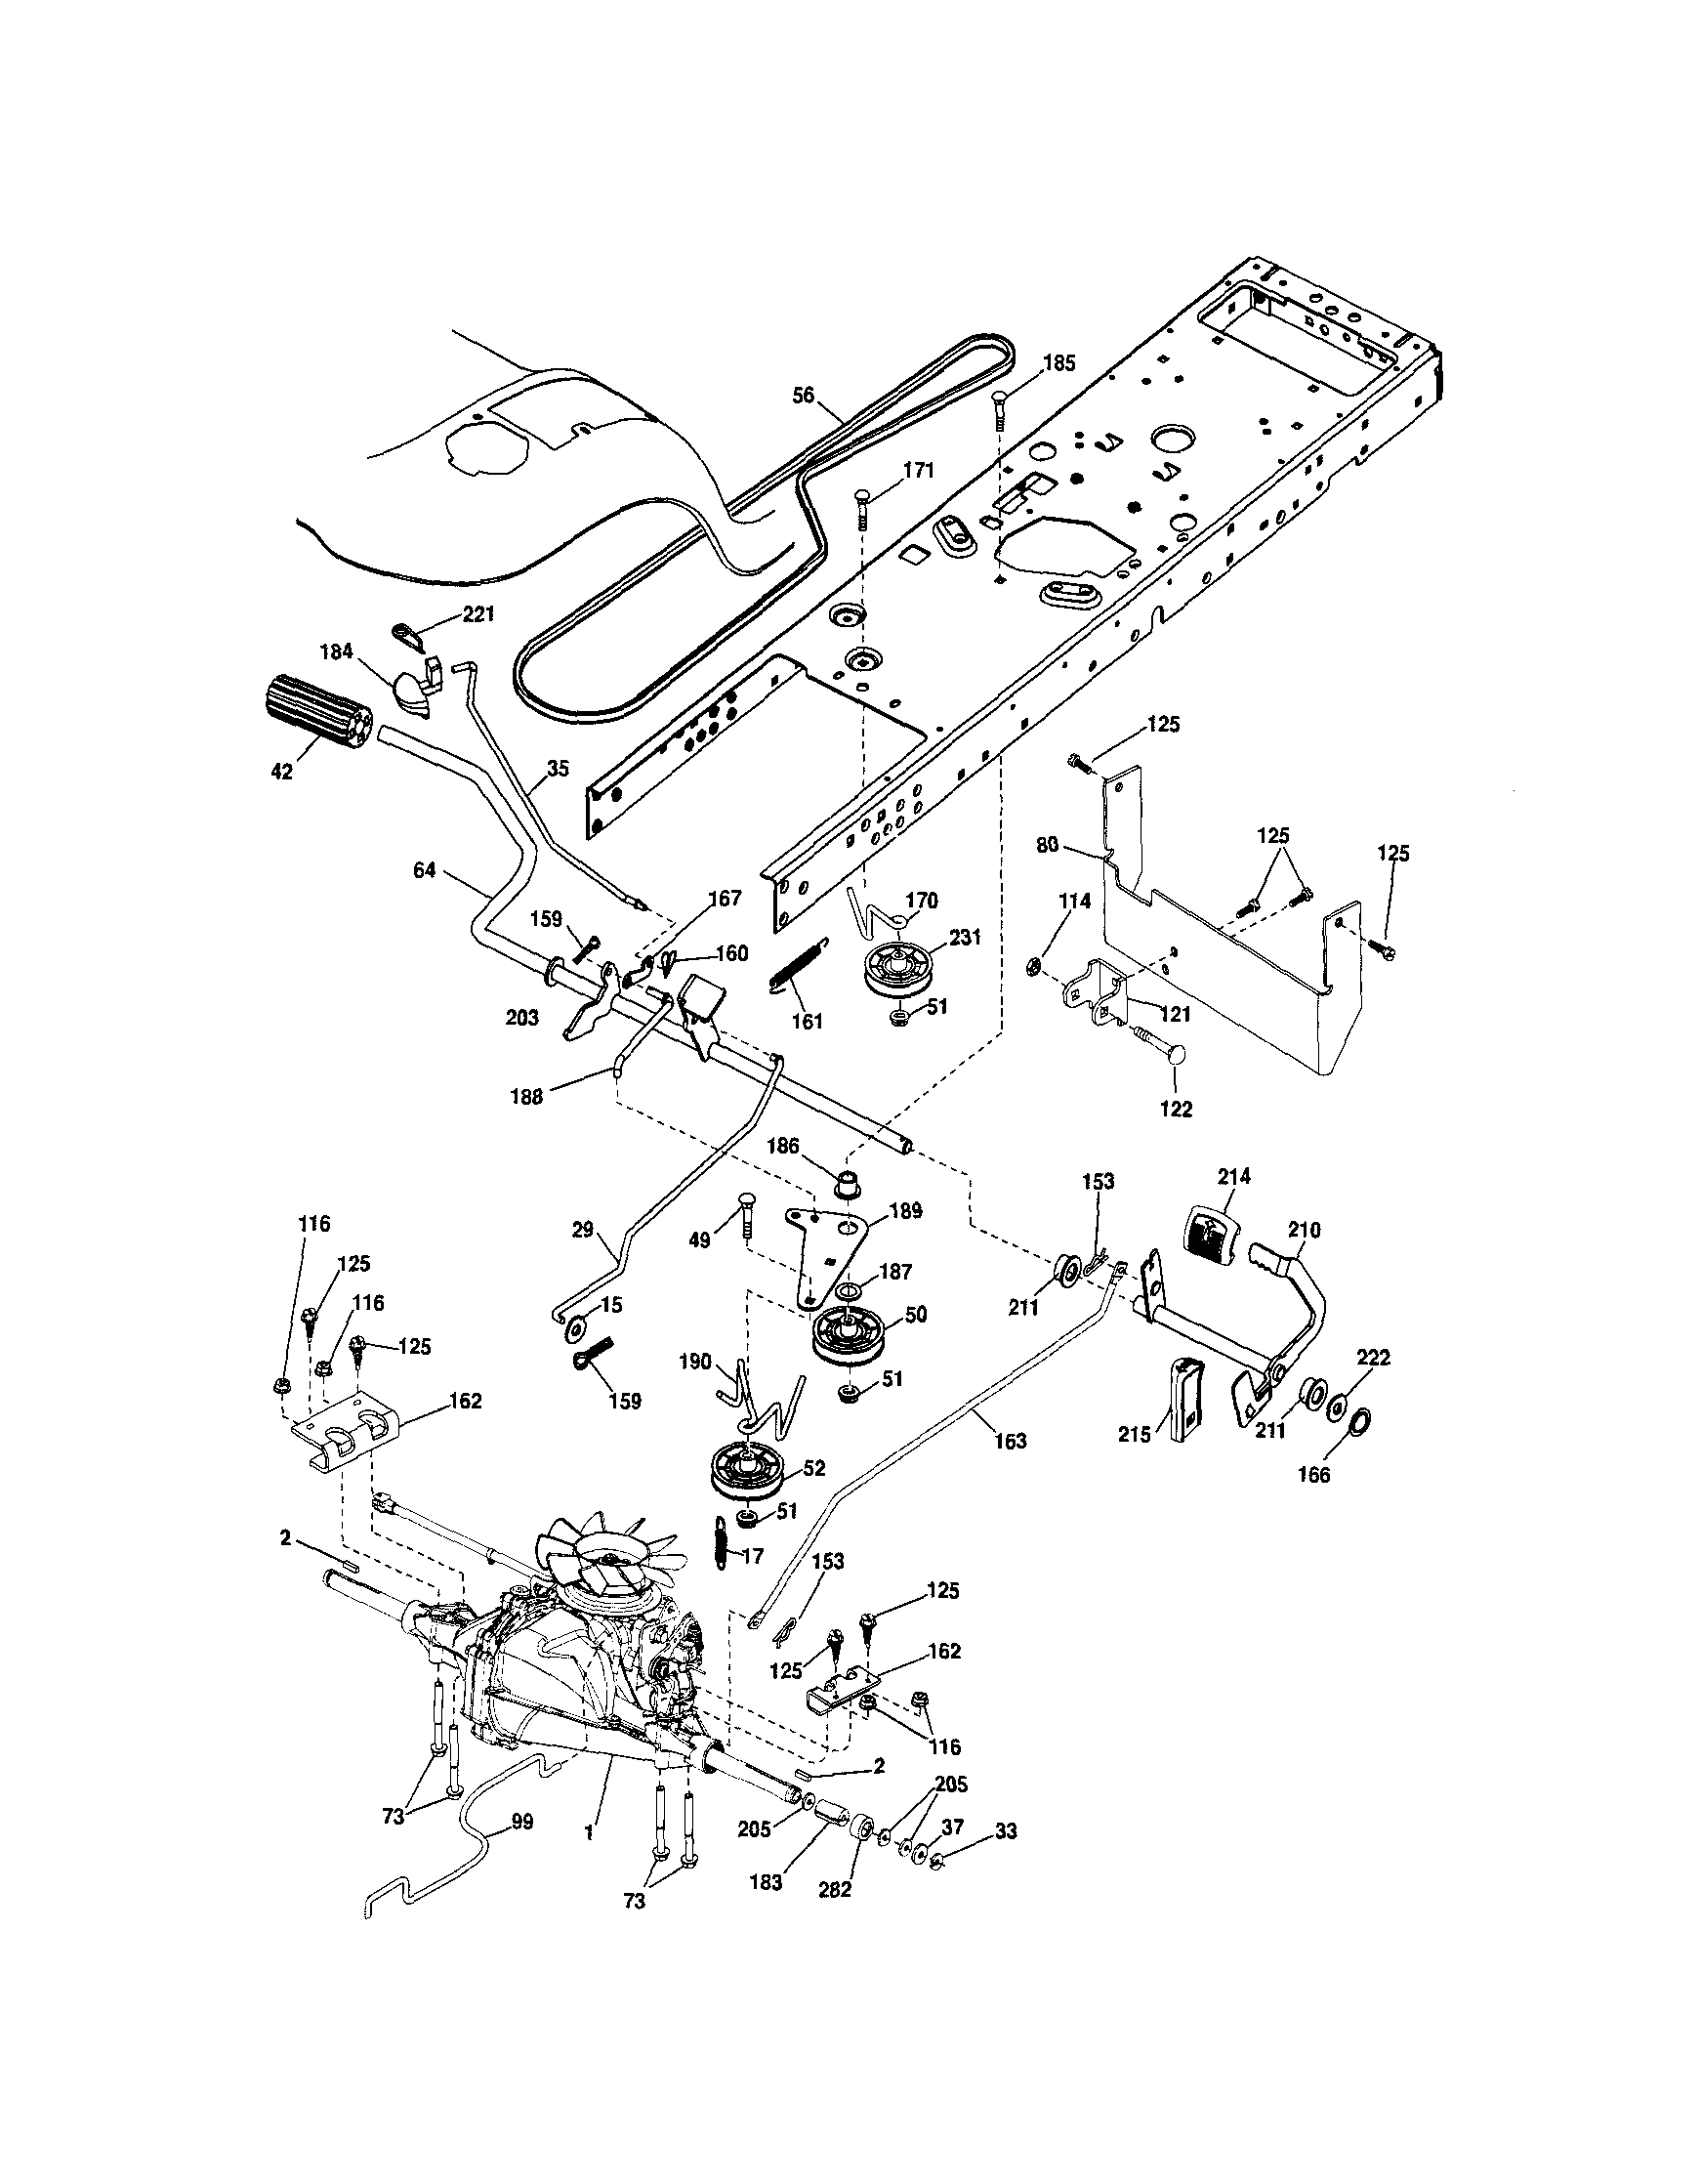 Lawn Mower Motor Diagram Electric Motor Switch Wiring